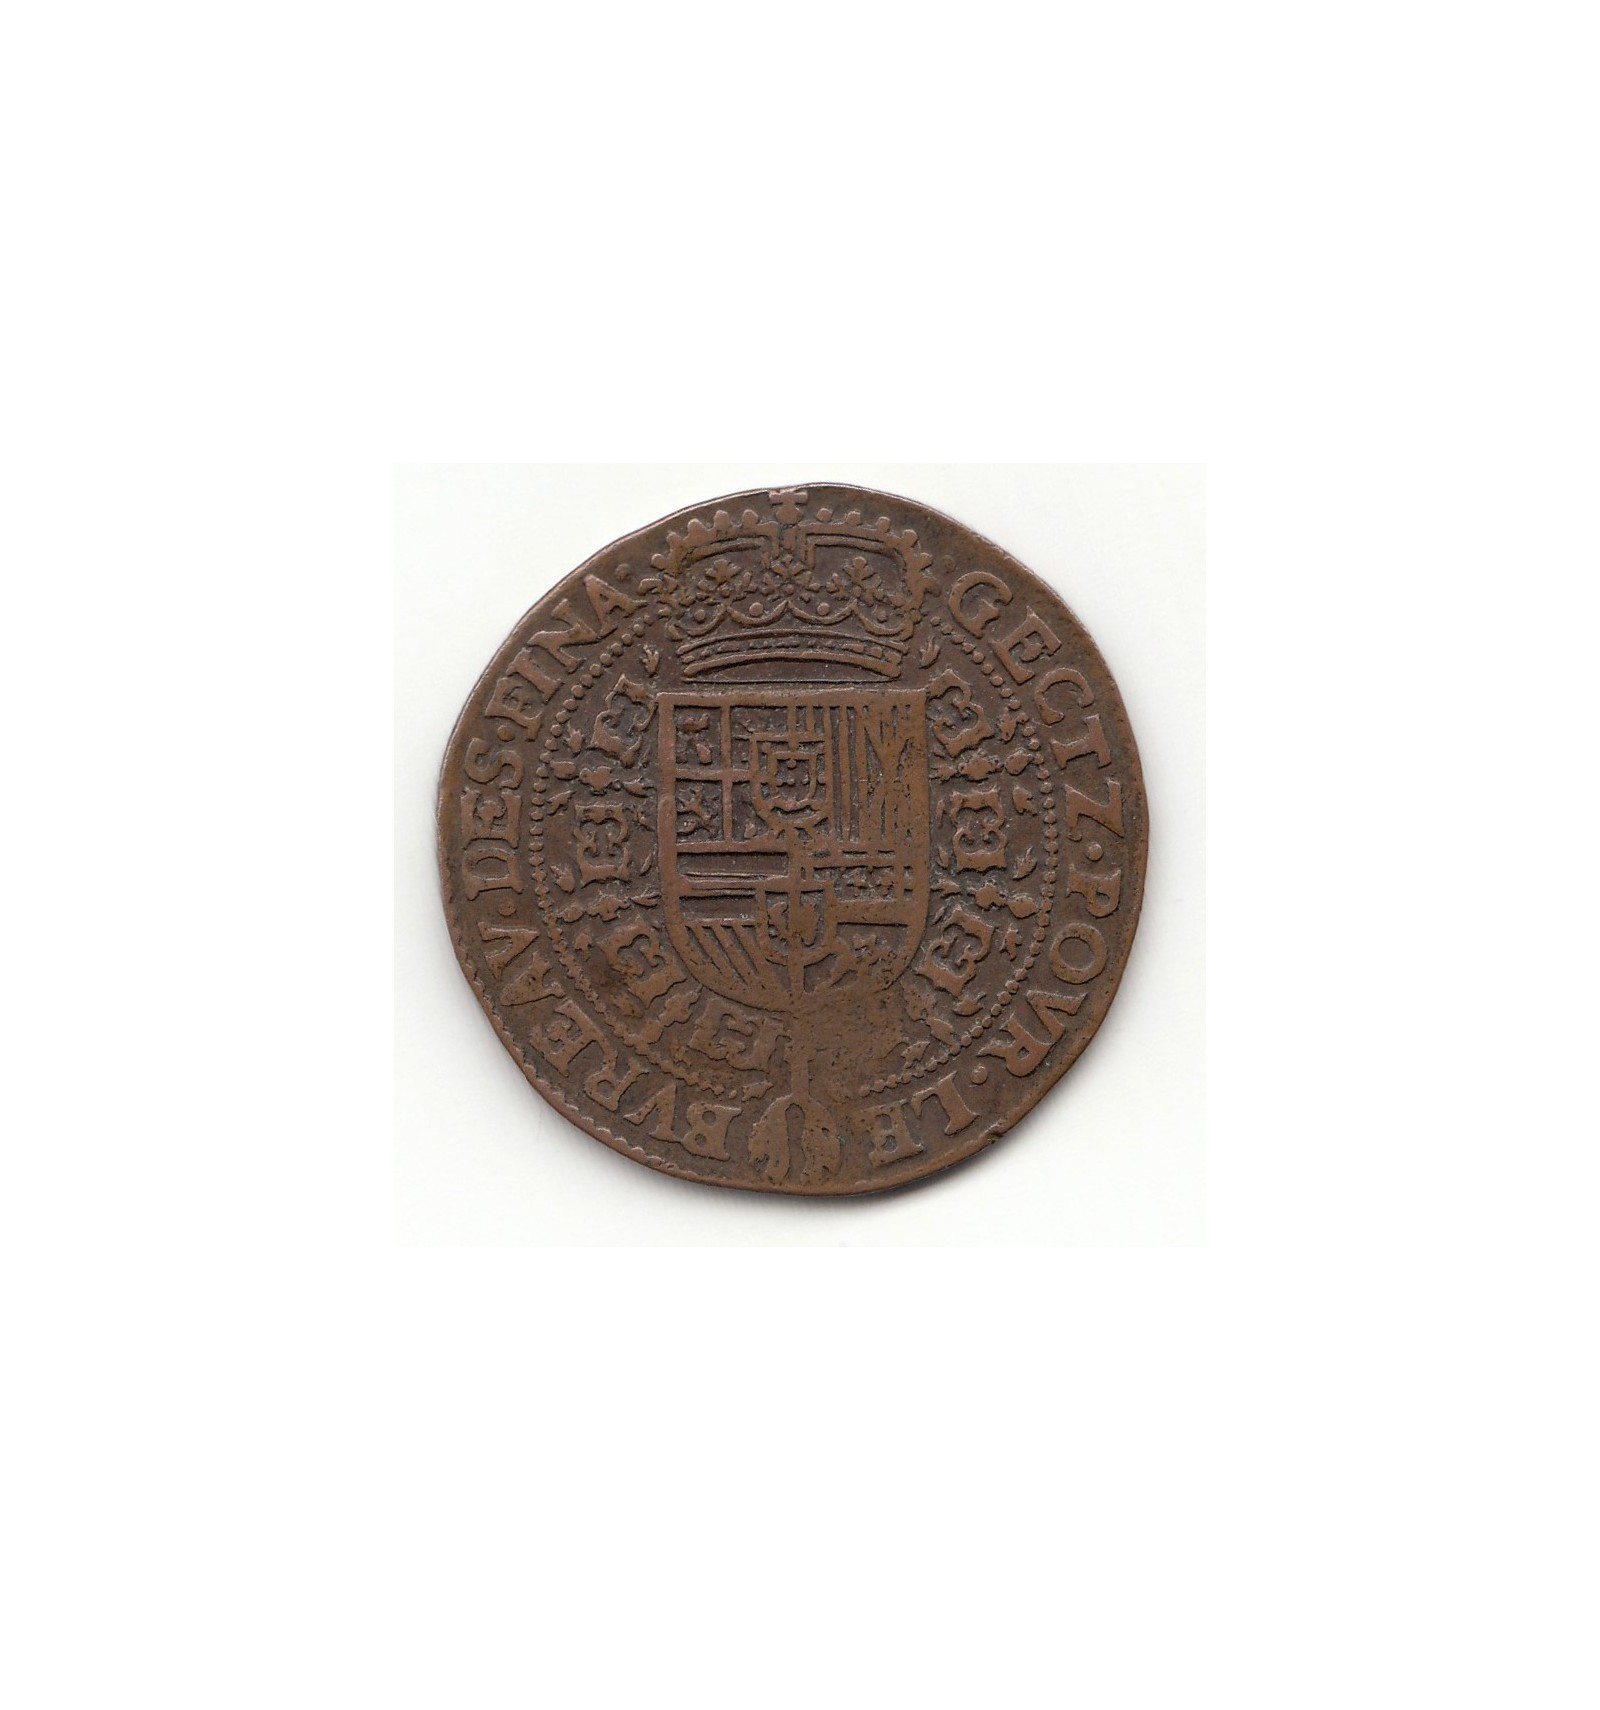 flandres jeton philippe iv bureau des finances 1644 jetons et medailles. Black Bedroom Furniture Sets. Home Design Ideas